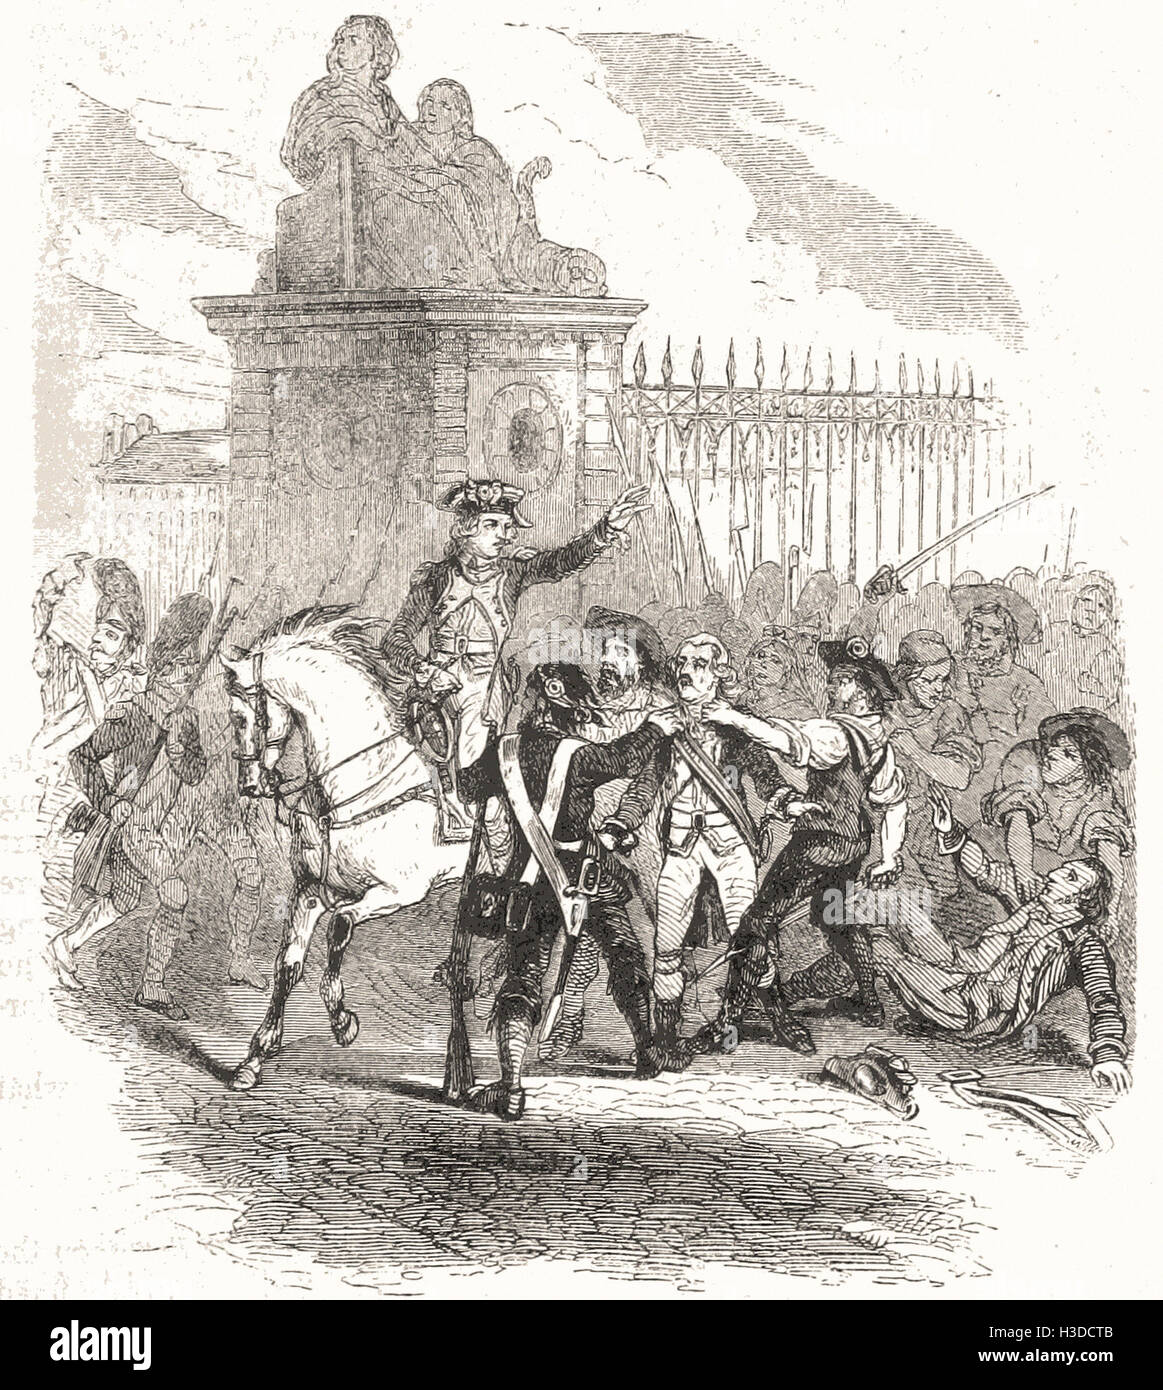 LA FAYETTE RESCUTNG THE GARDE DU CORPS, OCT. 6, 1789 - Stock Image